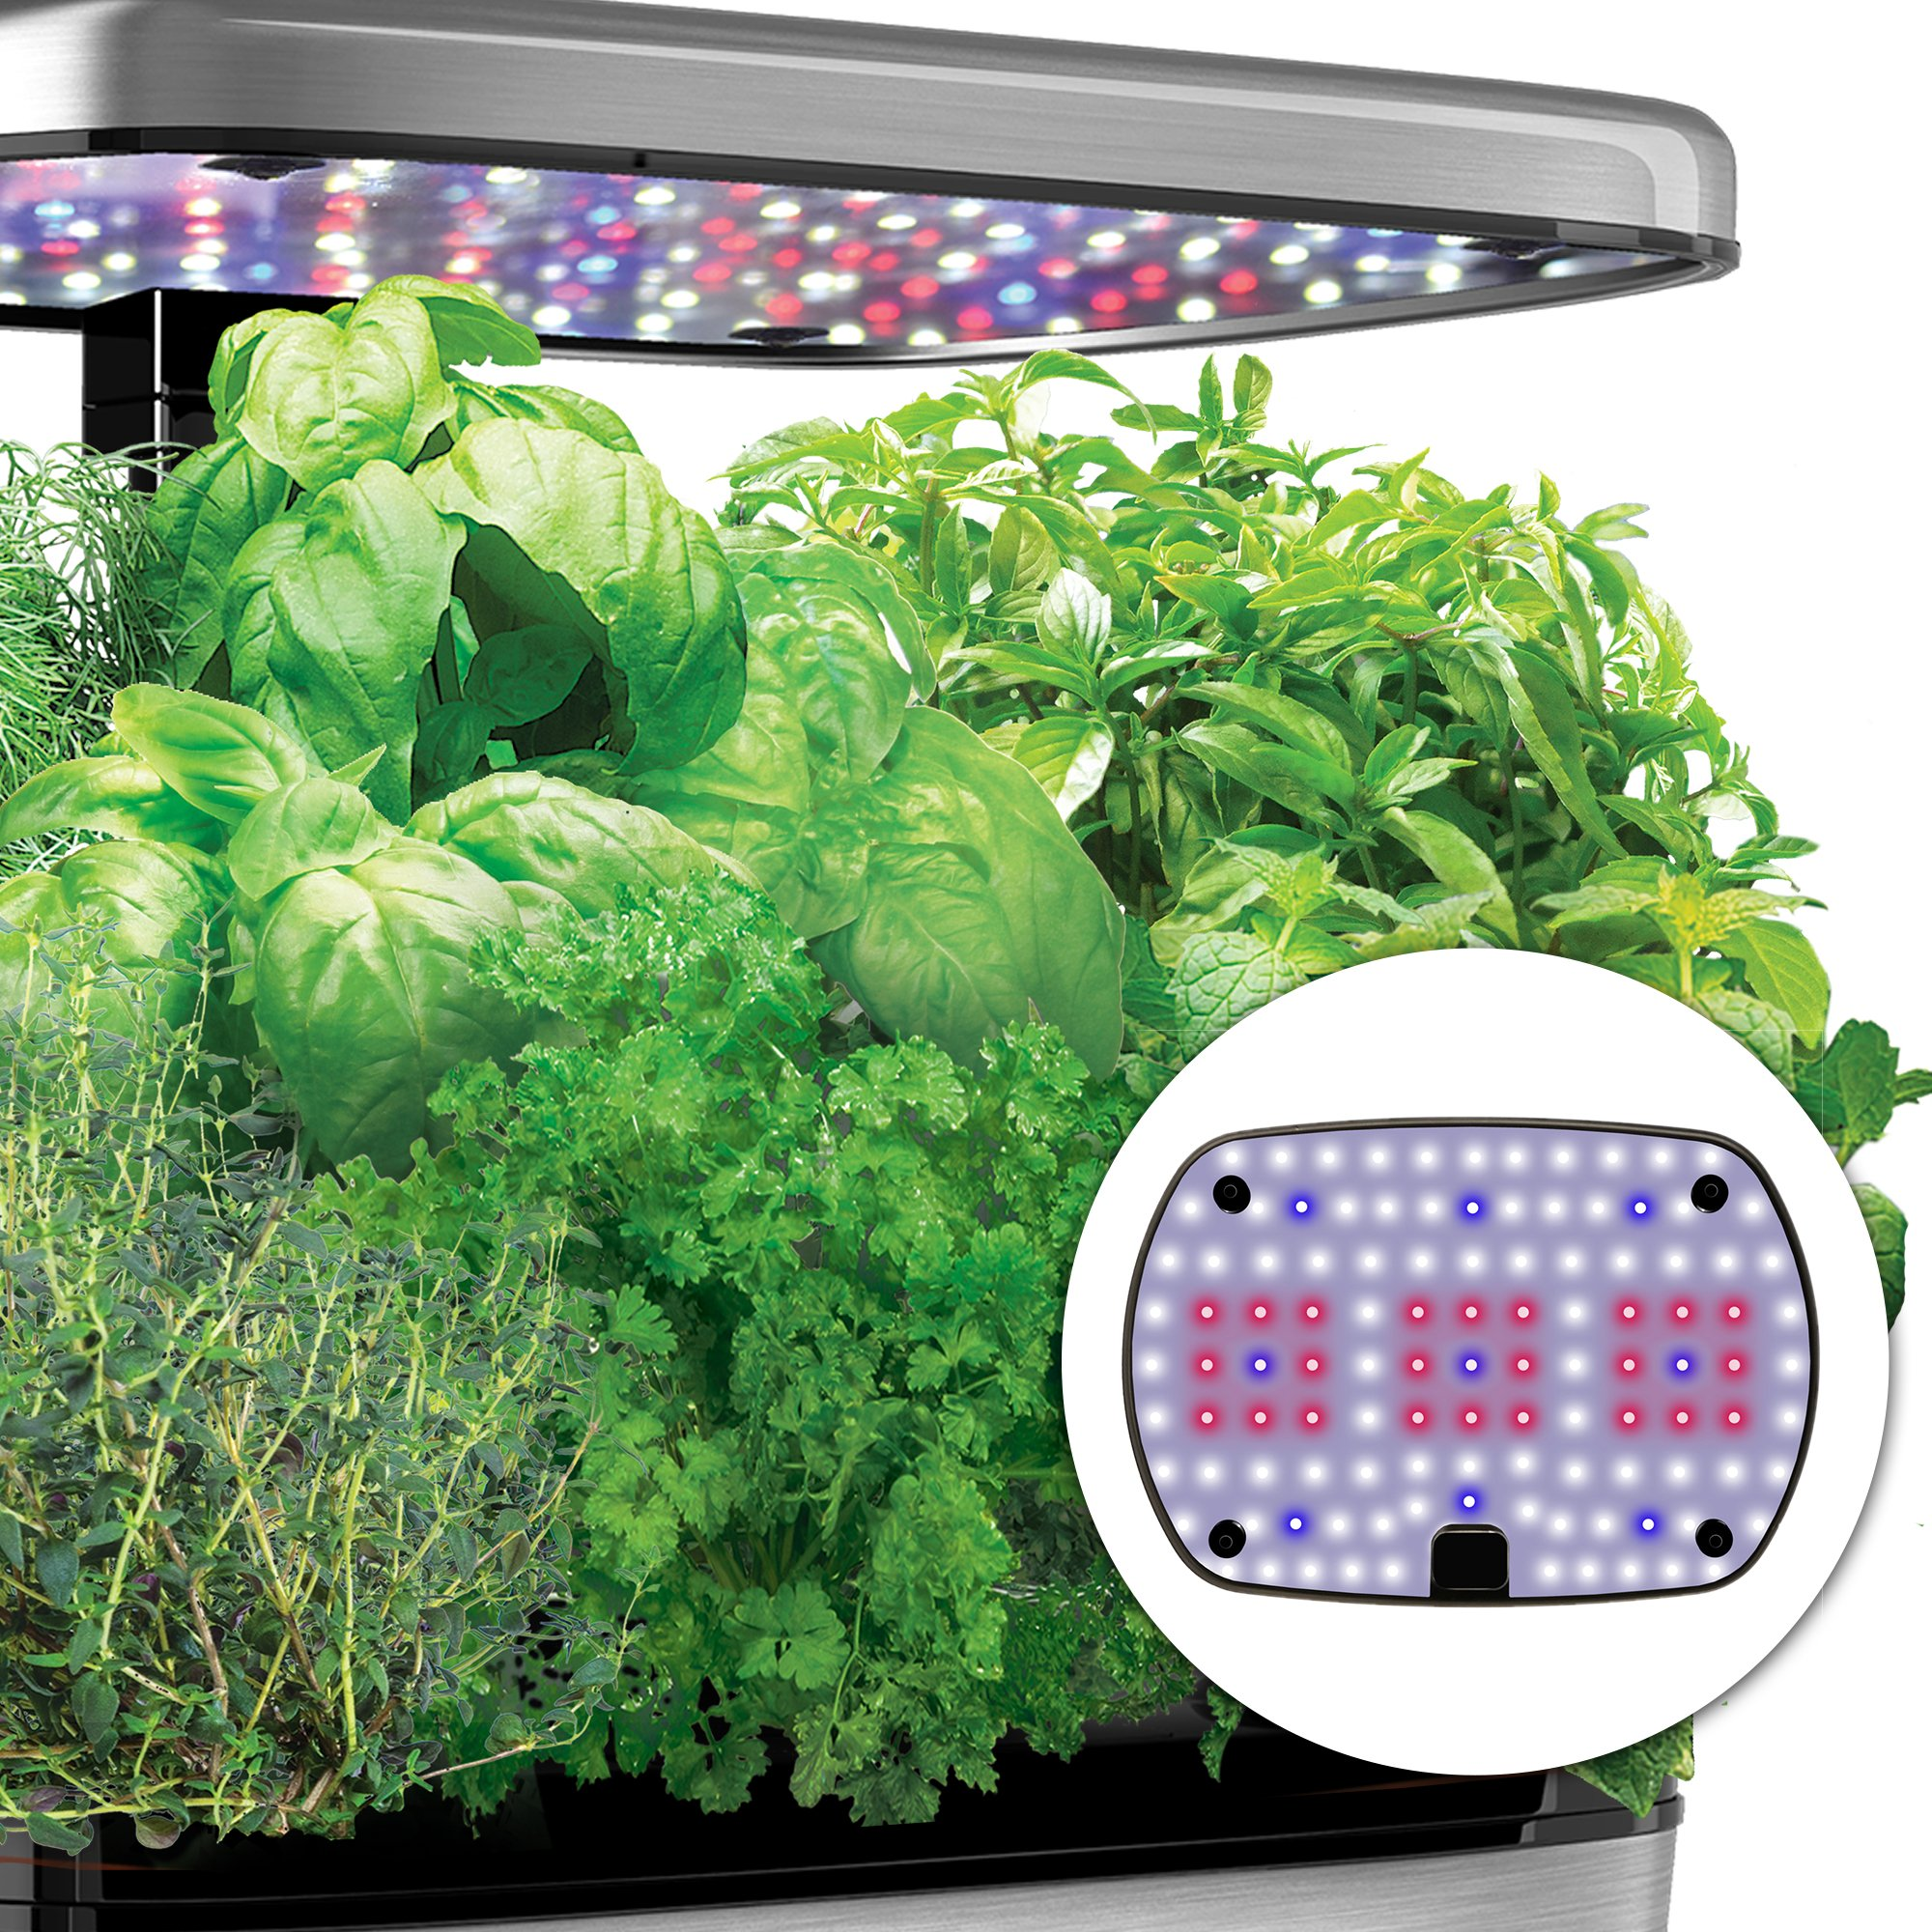 AeroGarden Harvest Elite with Gourmet Herb Seed Pod Kit, Stainless Steel by AeroGrow (Image #4)